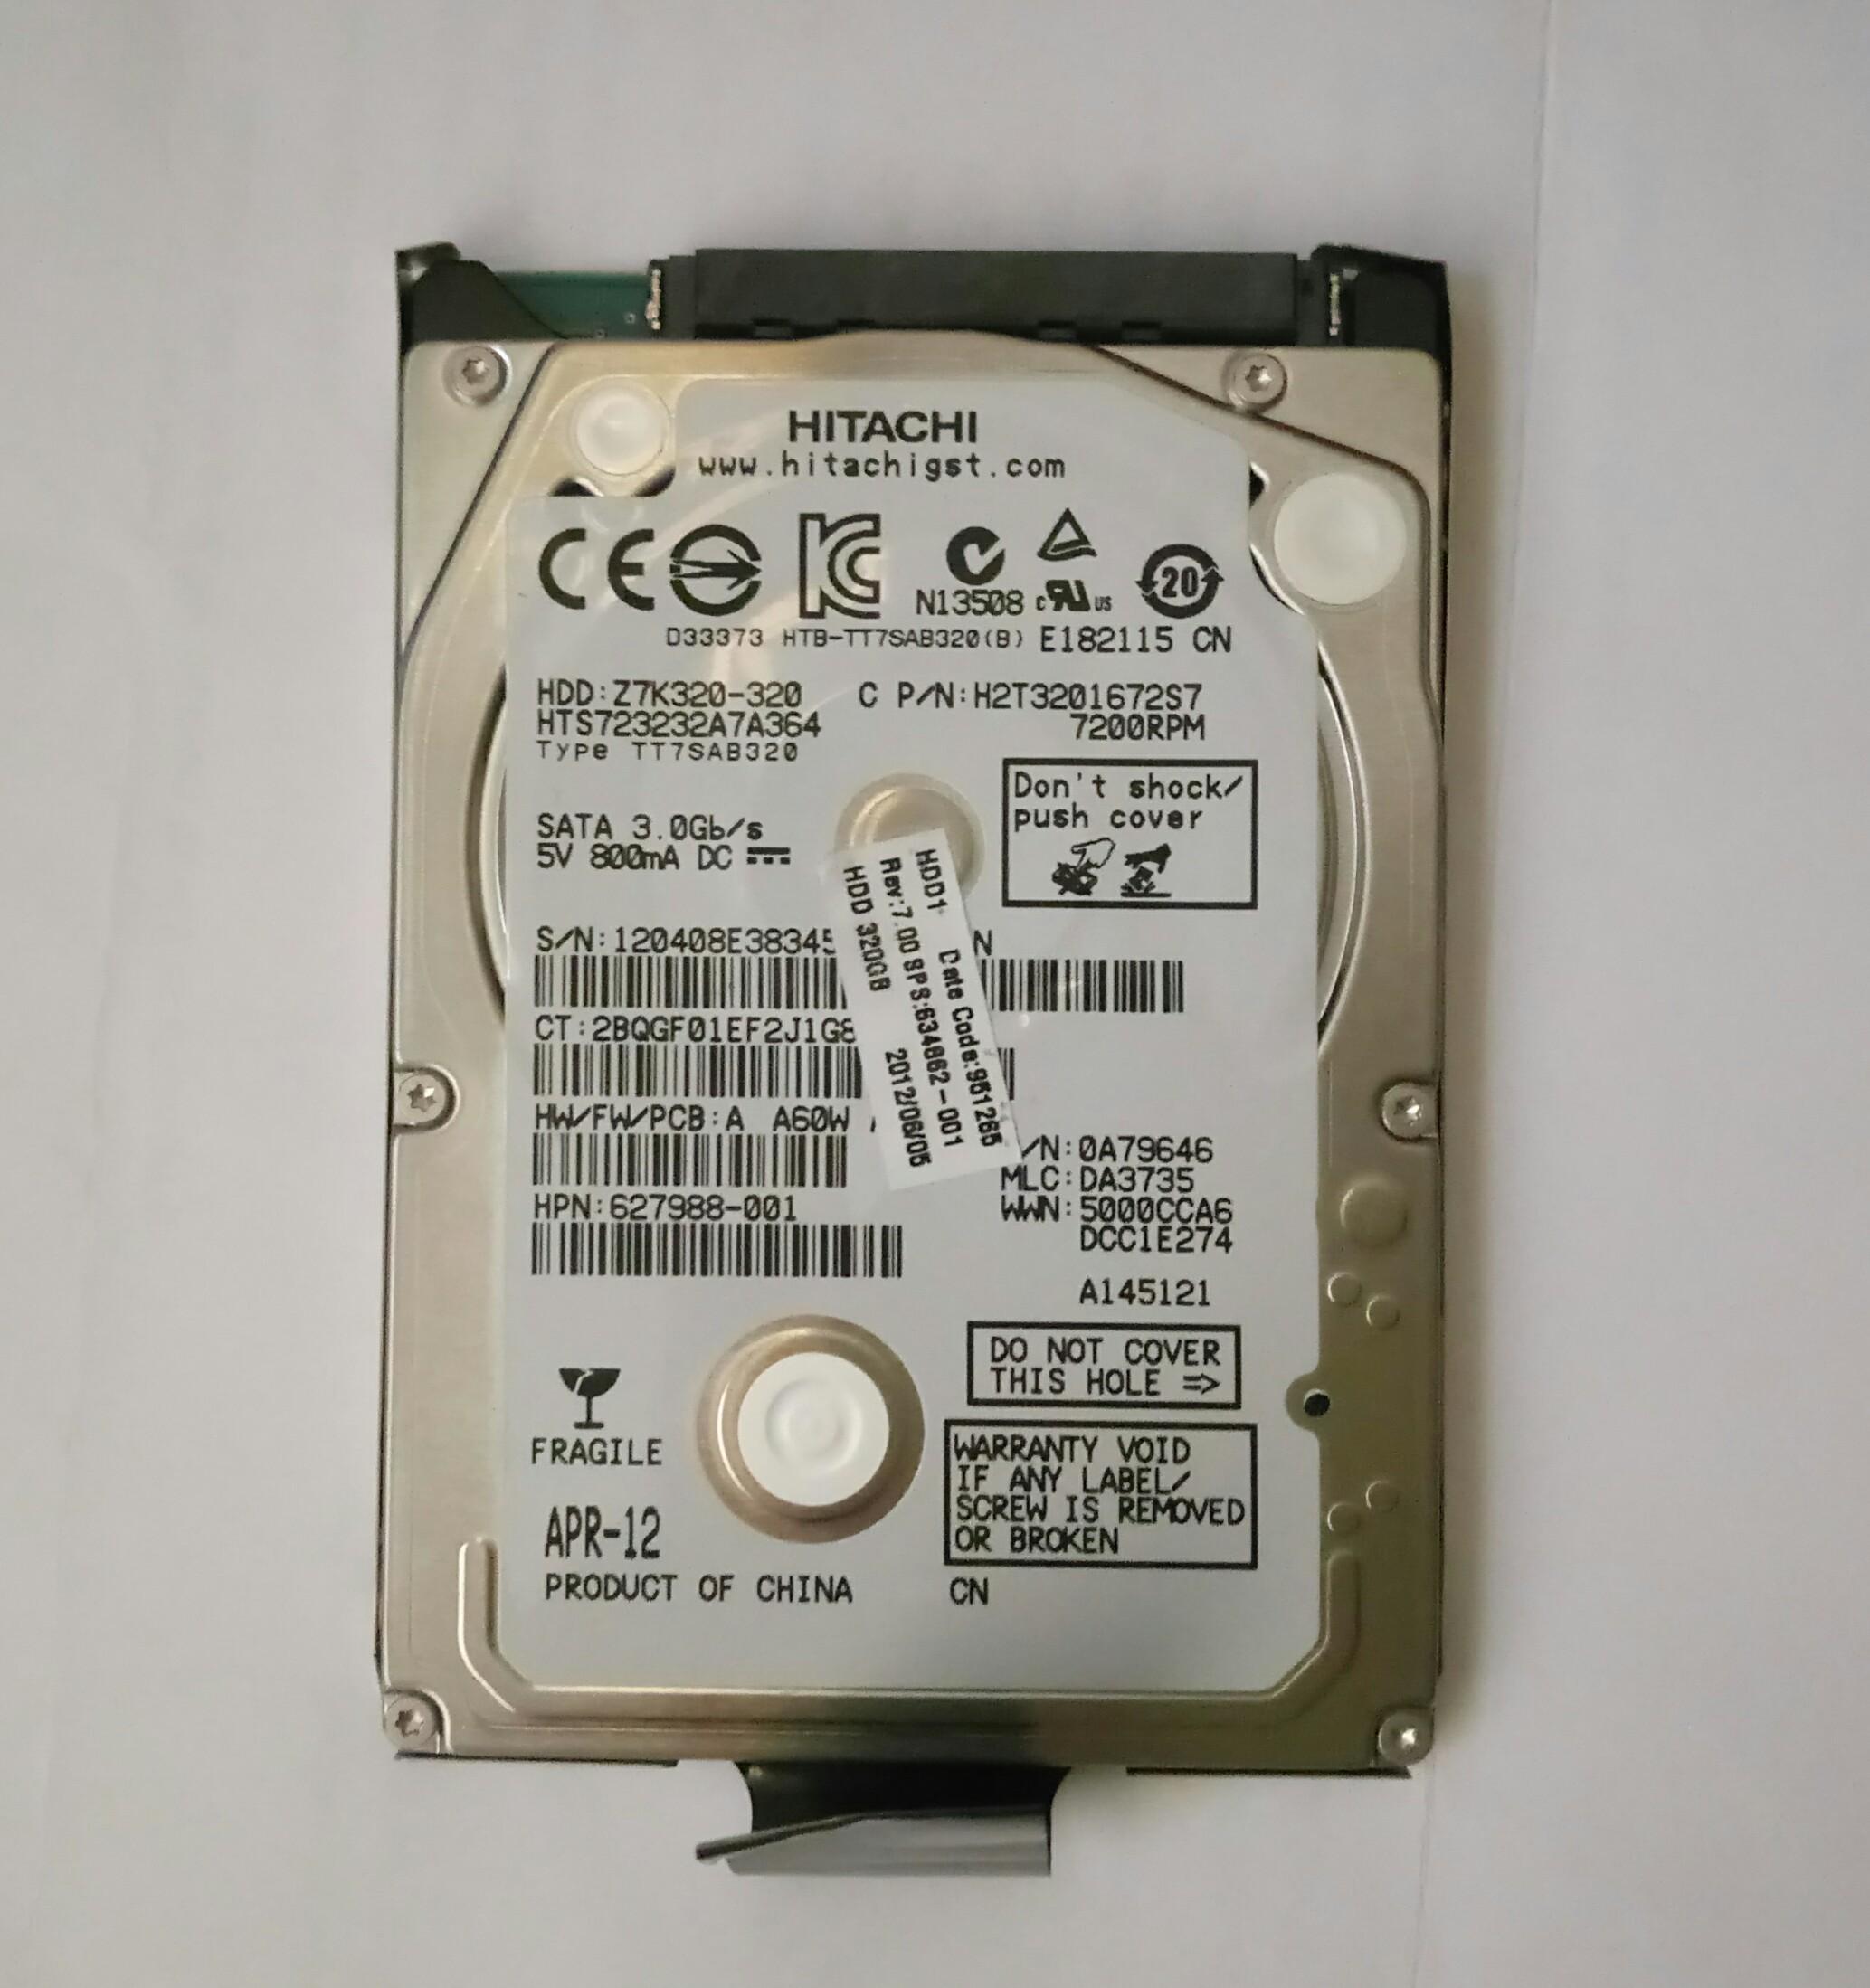 Cannot unlock locked original hard drive from EliteBook 8460